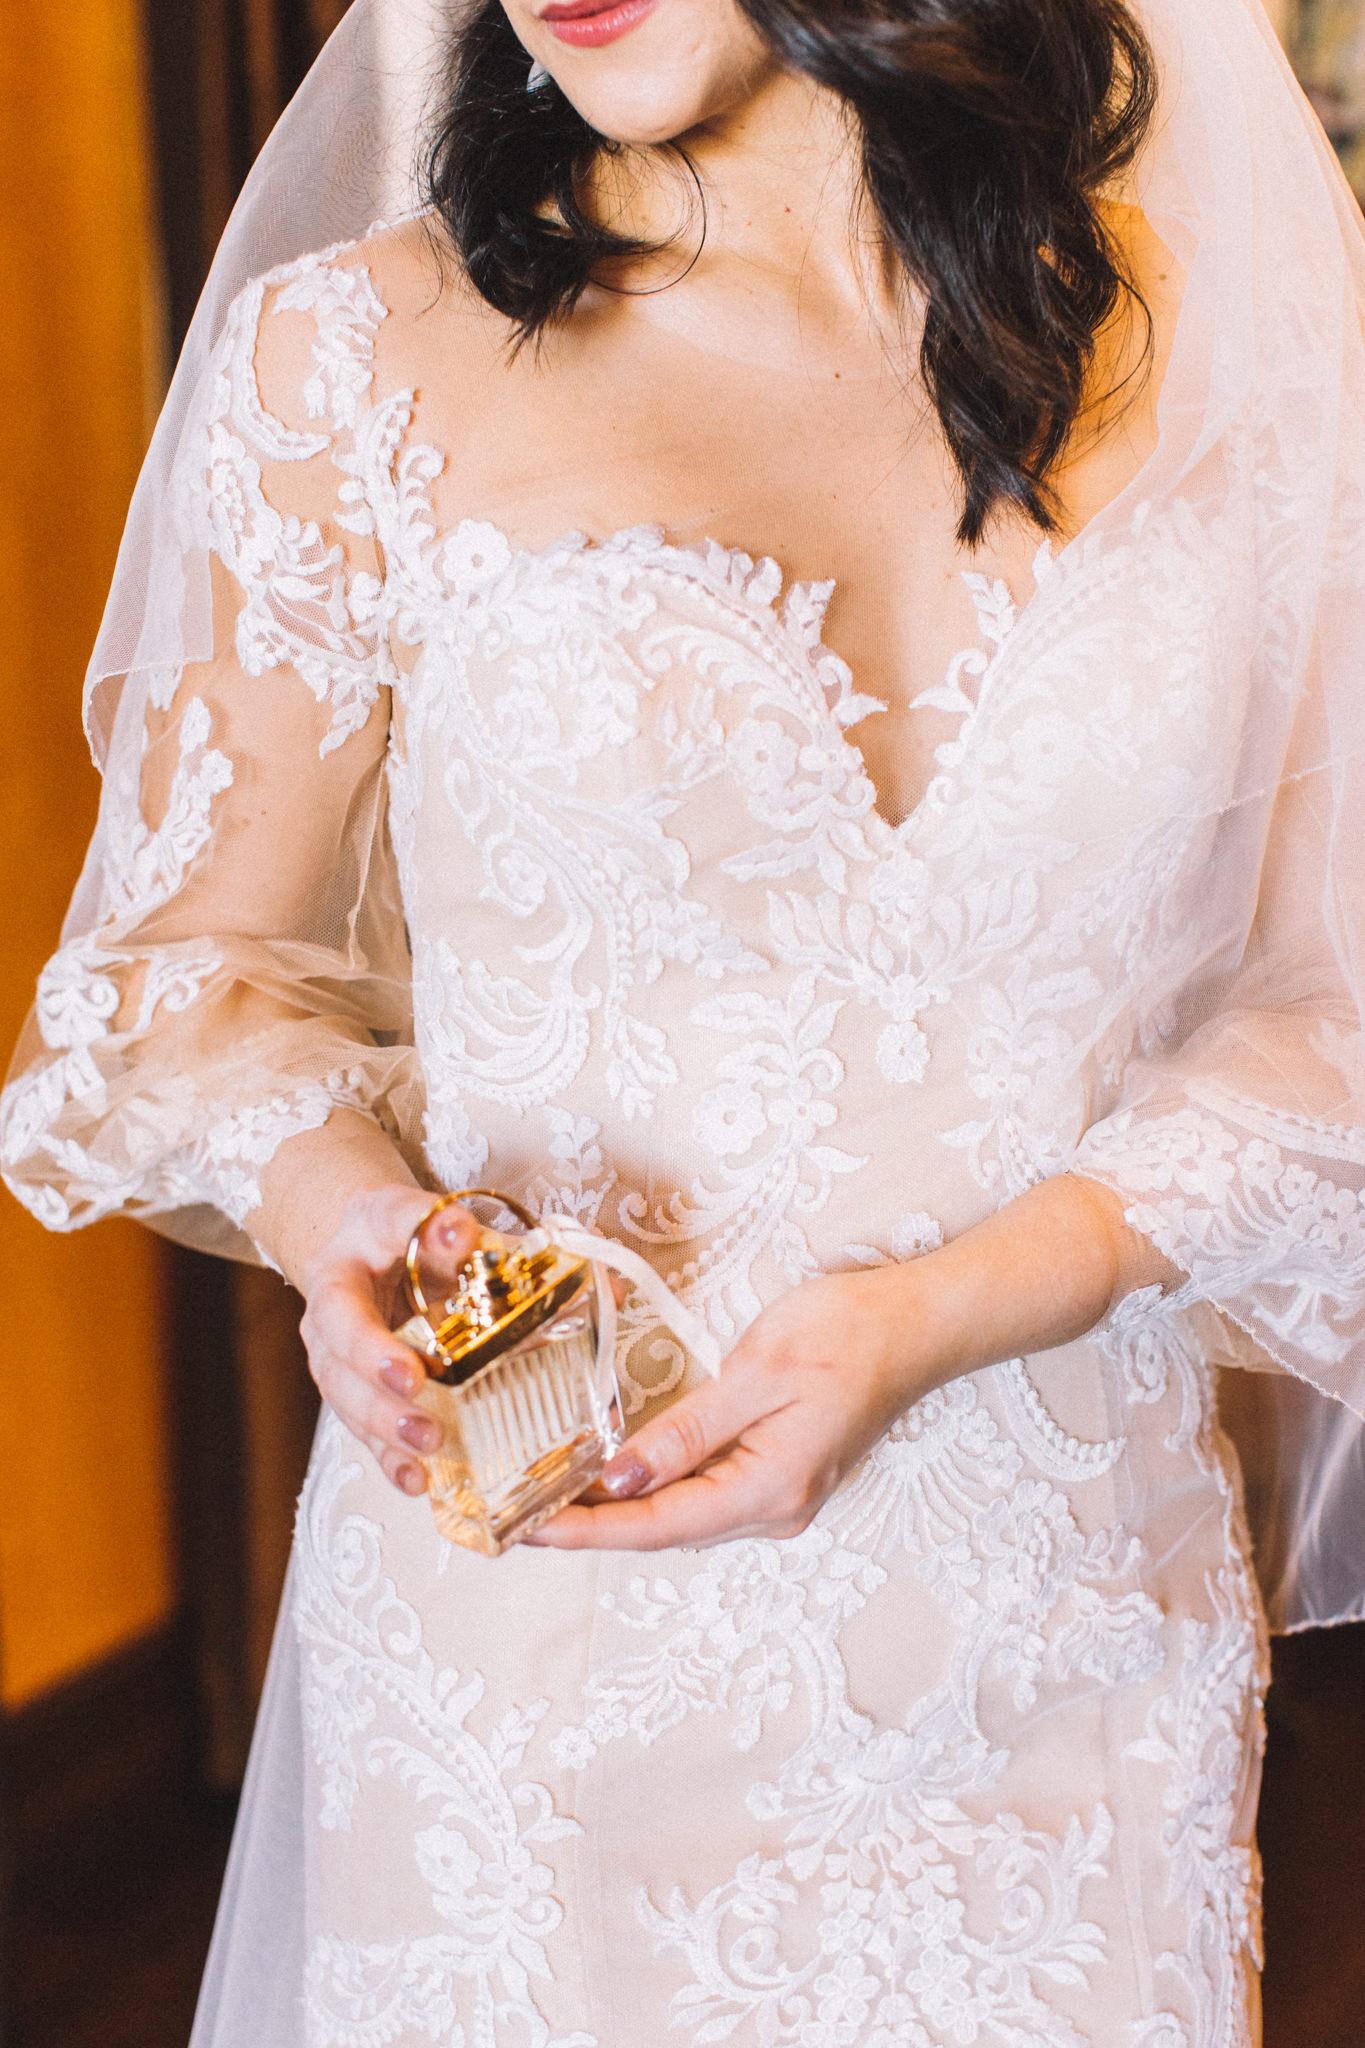 bridal portraits with details